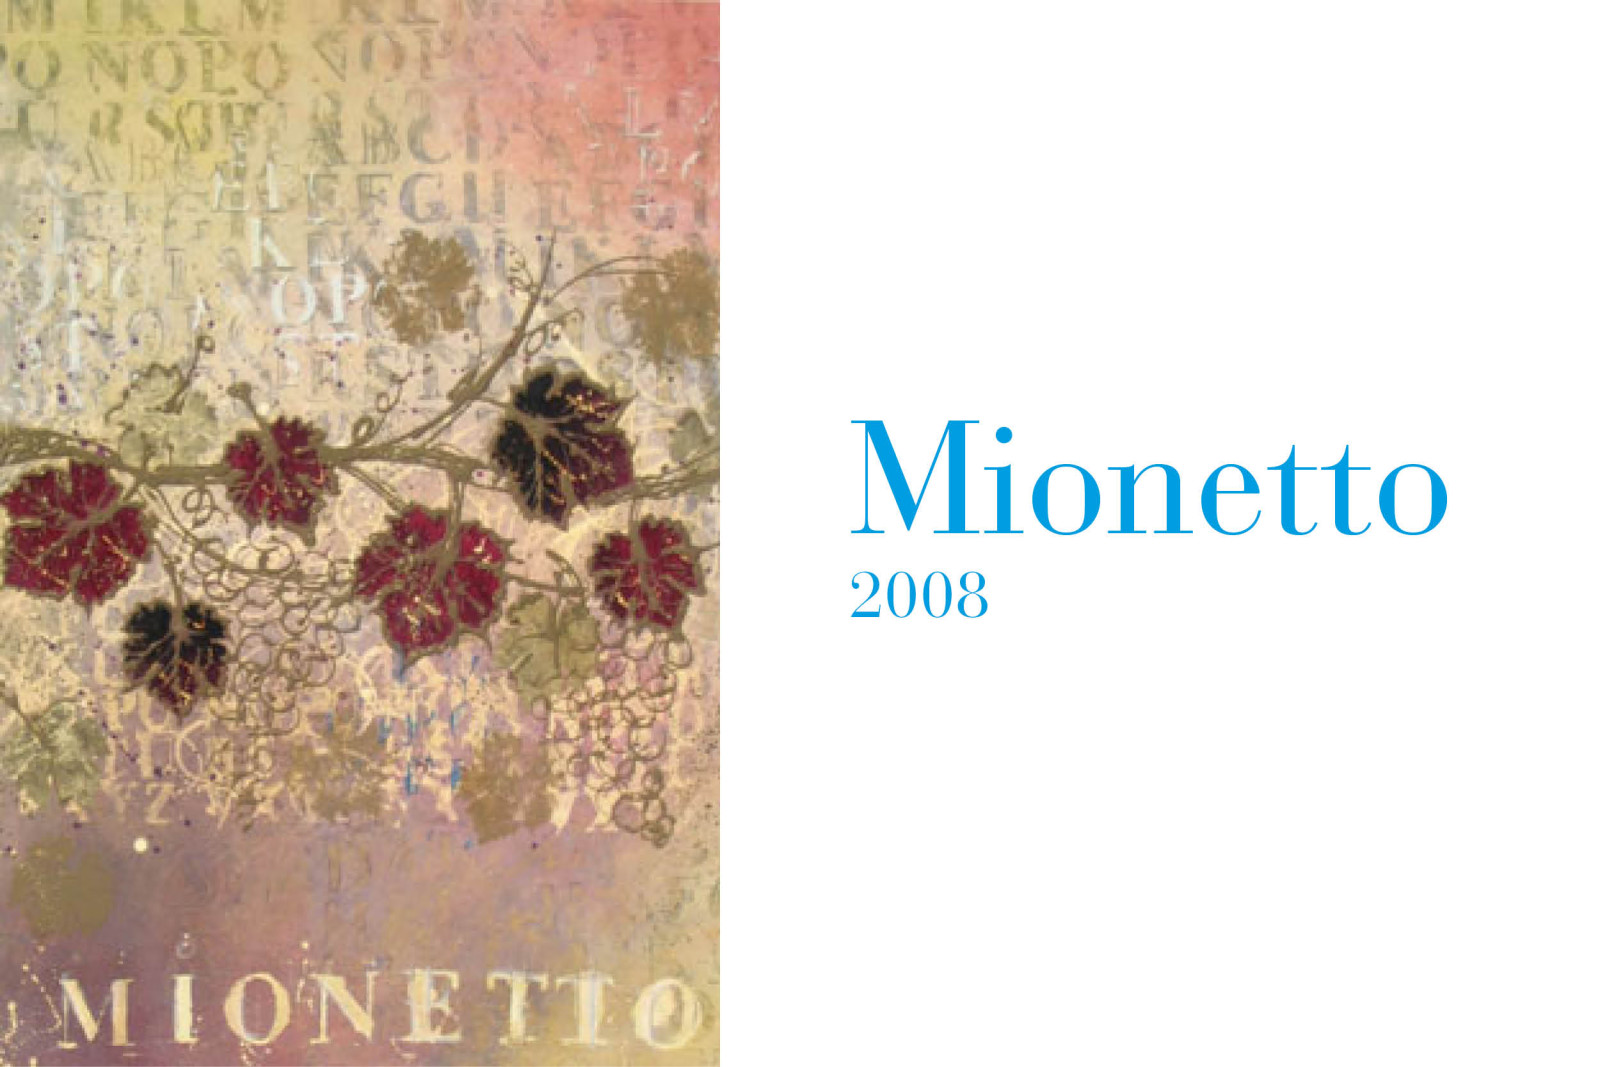 Benetta_Mionetto